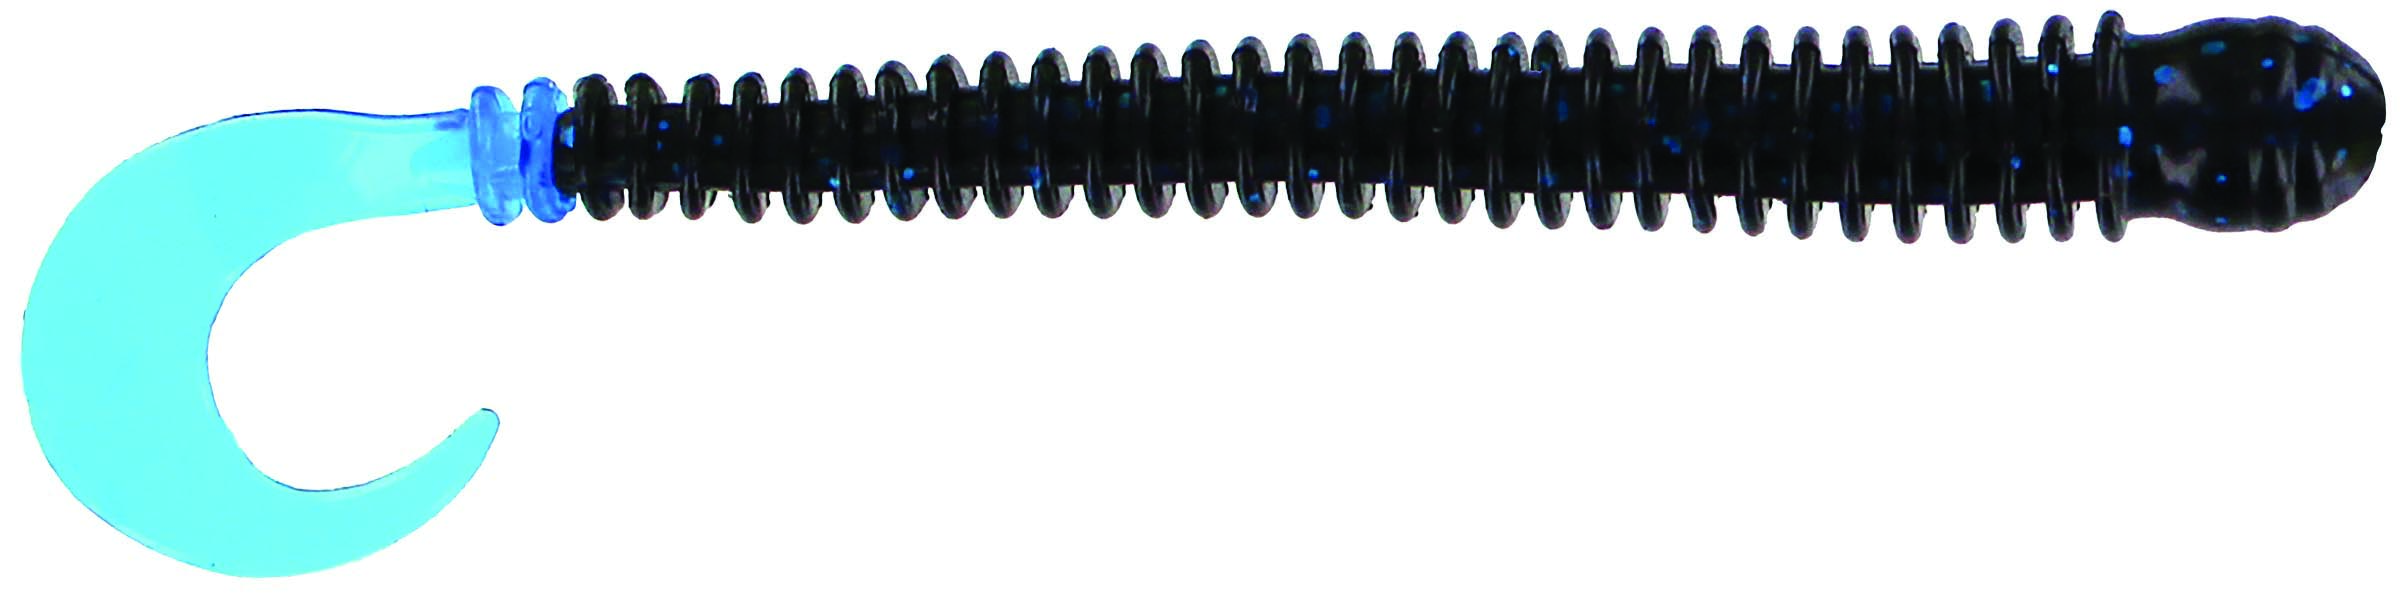 Big Bite Baits - Disc Ring Worm - 4 inch - RW-418 - BLACK BLUE METAL FLAKE BLUE TAIL